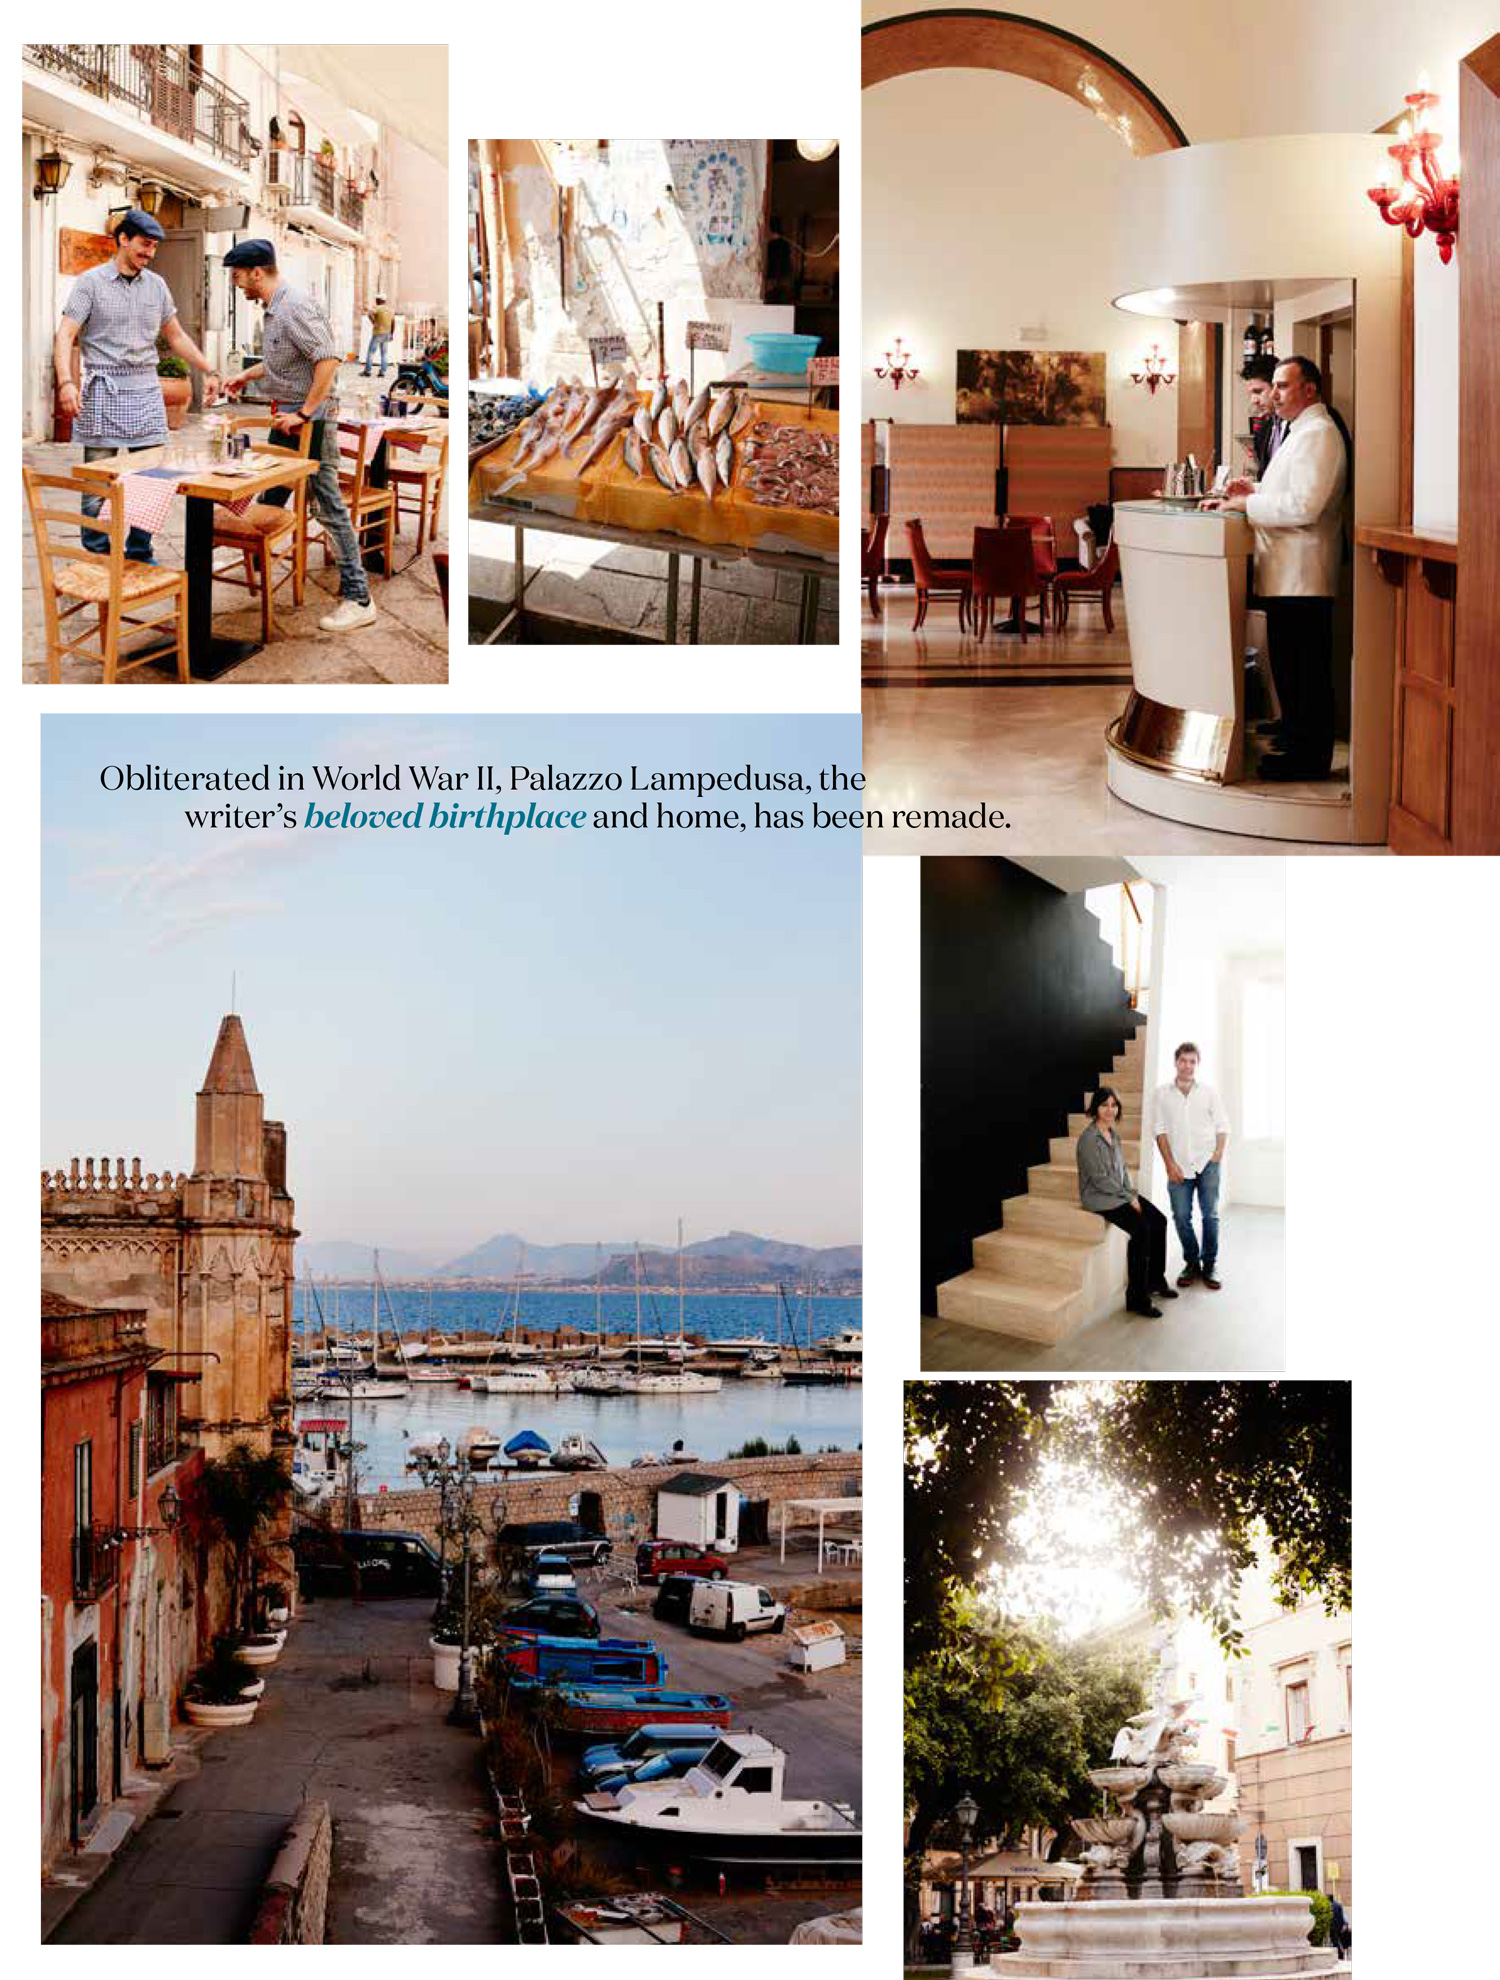 Palermo-7.jpg